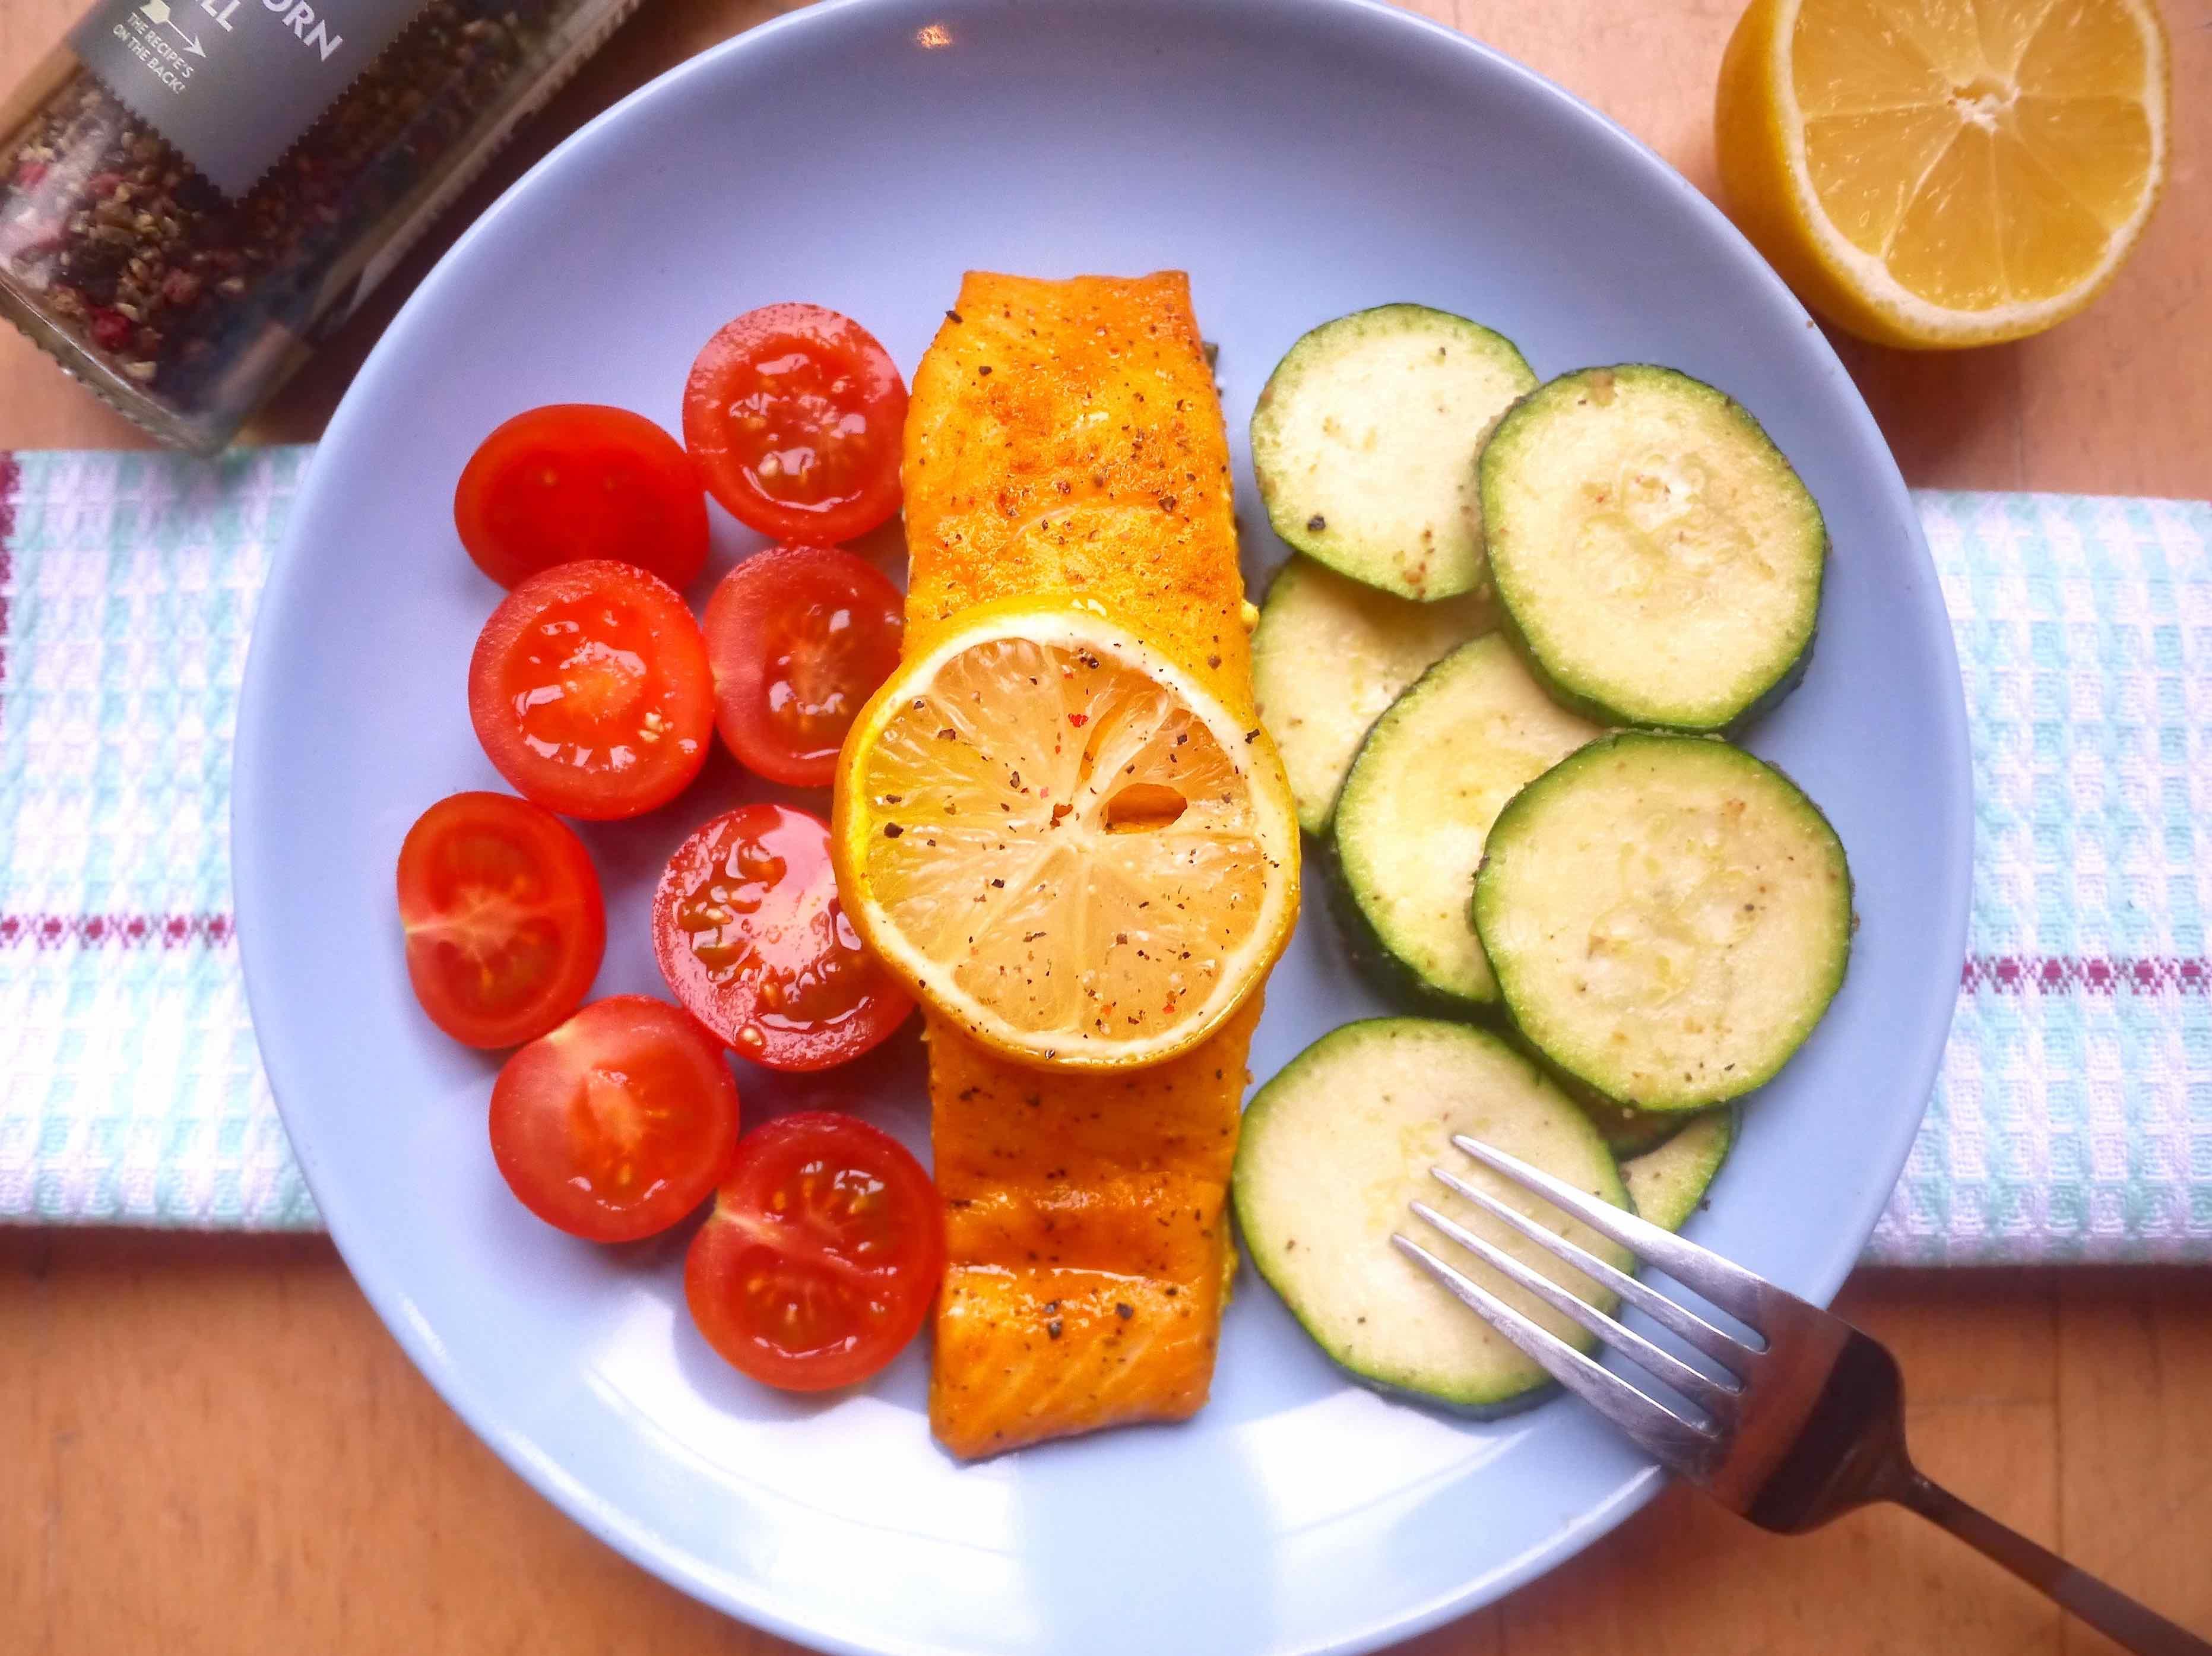 Salmon Recipe Sweetlemonpepperturmericsalmonpaleoperchancetocook1